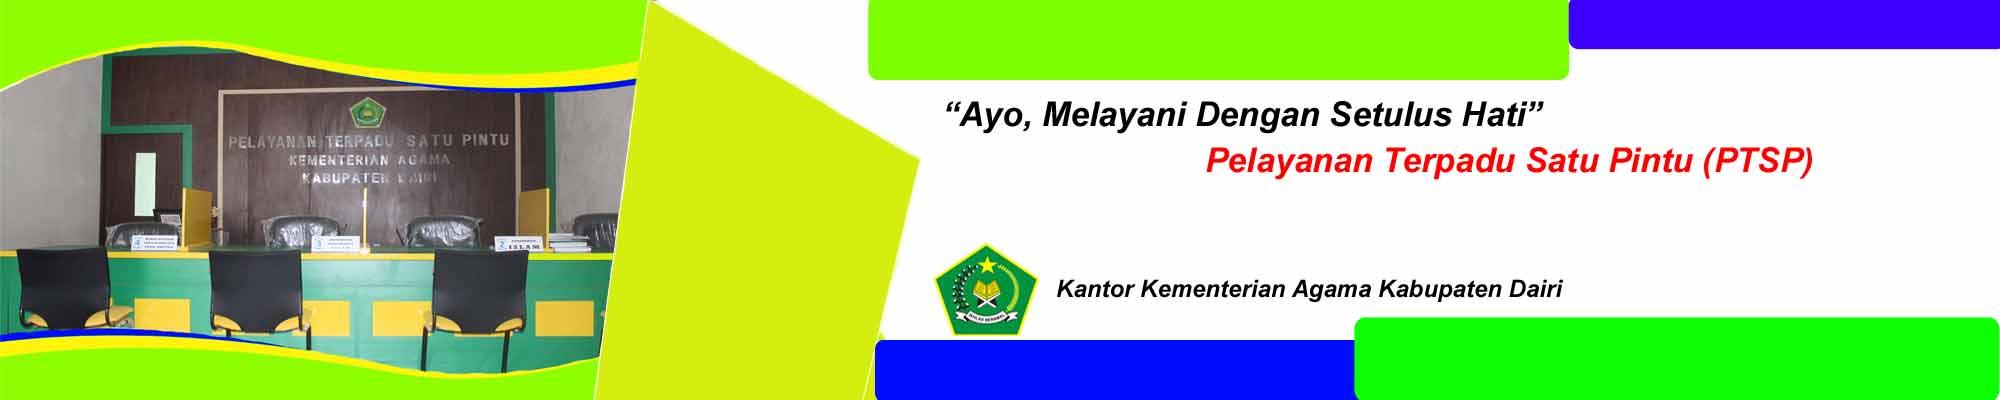 Kantor Kementerian Agama Kabupaten Dairi Jalan Pelita No 20 Sidikalang